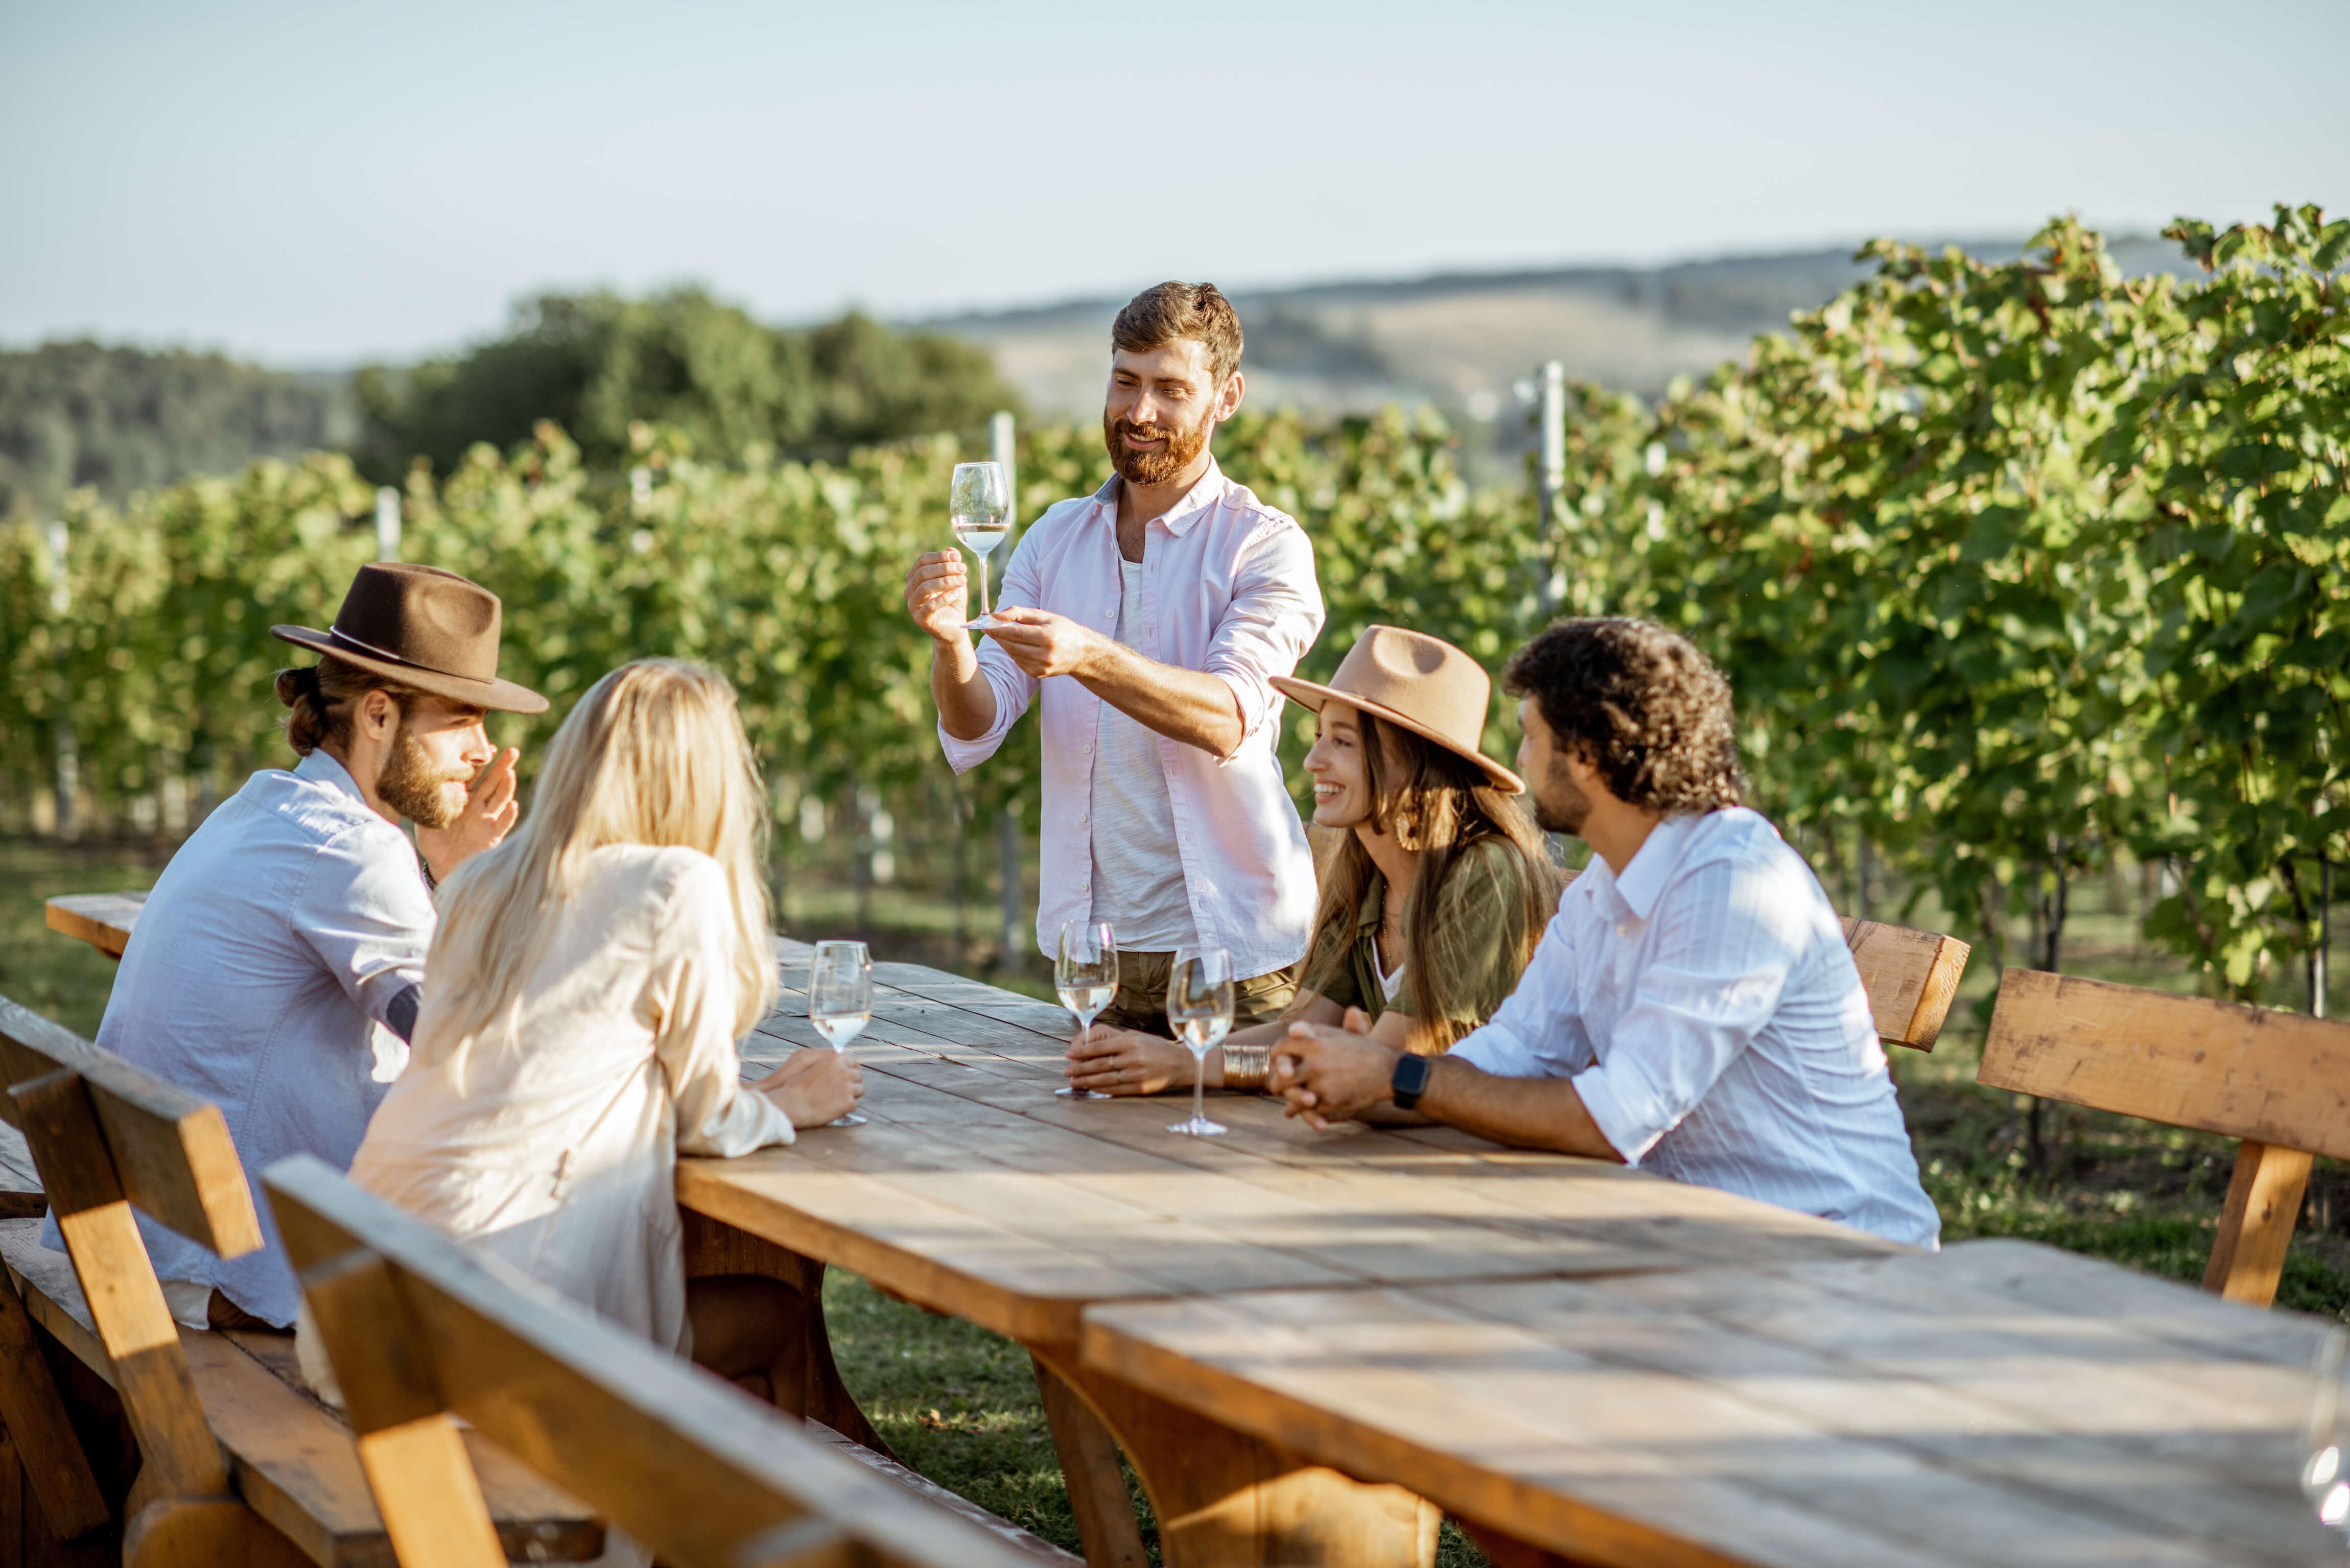 New Zealand locals enjoying wine in the sunshine